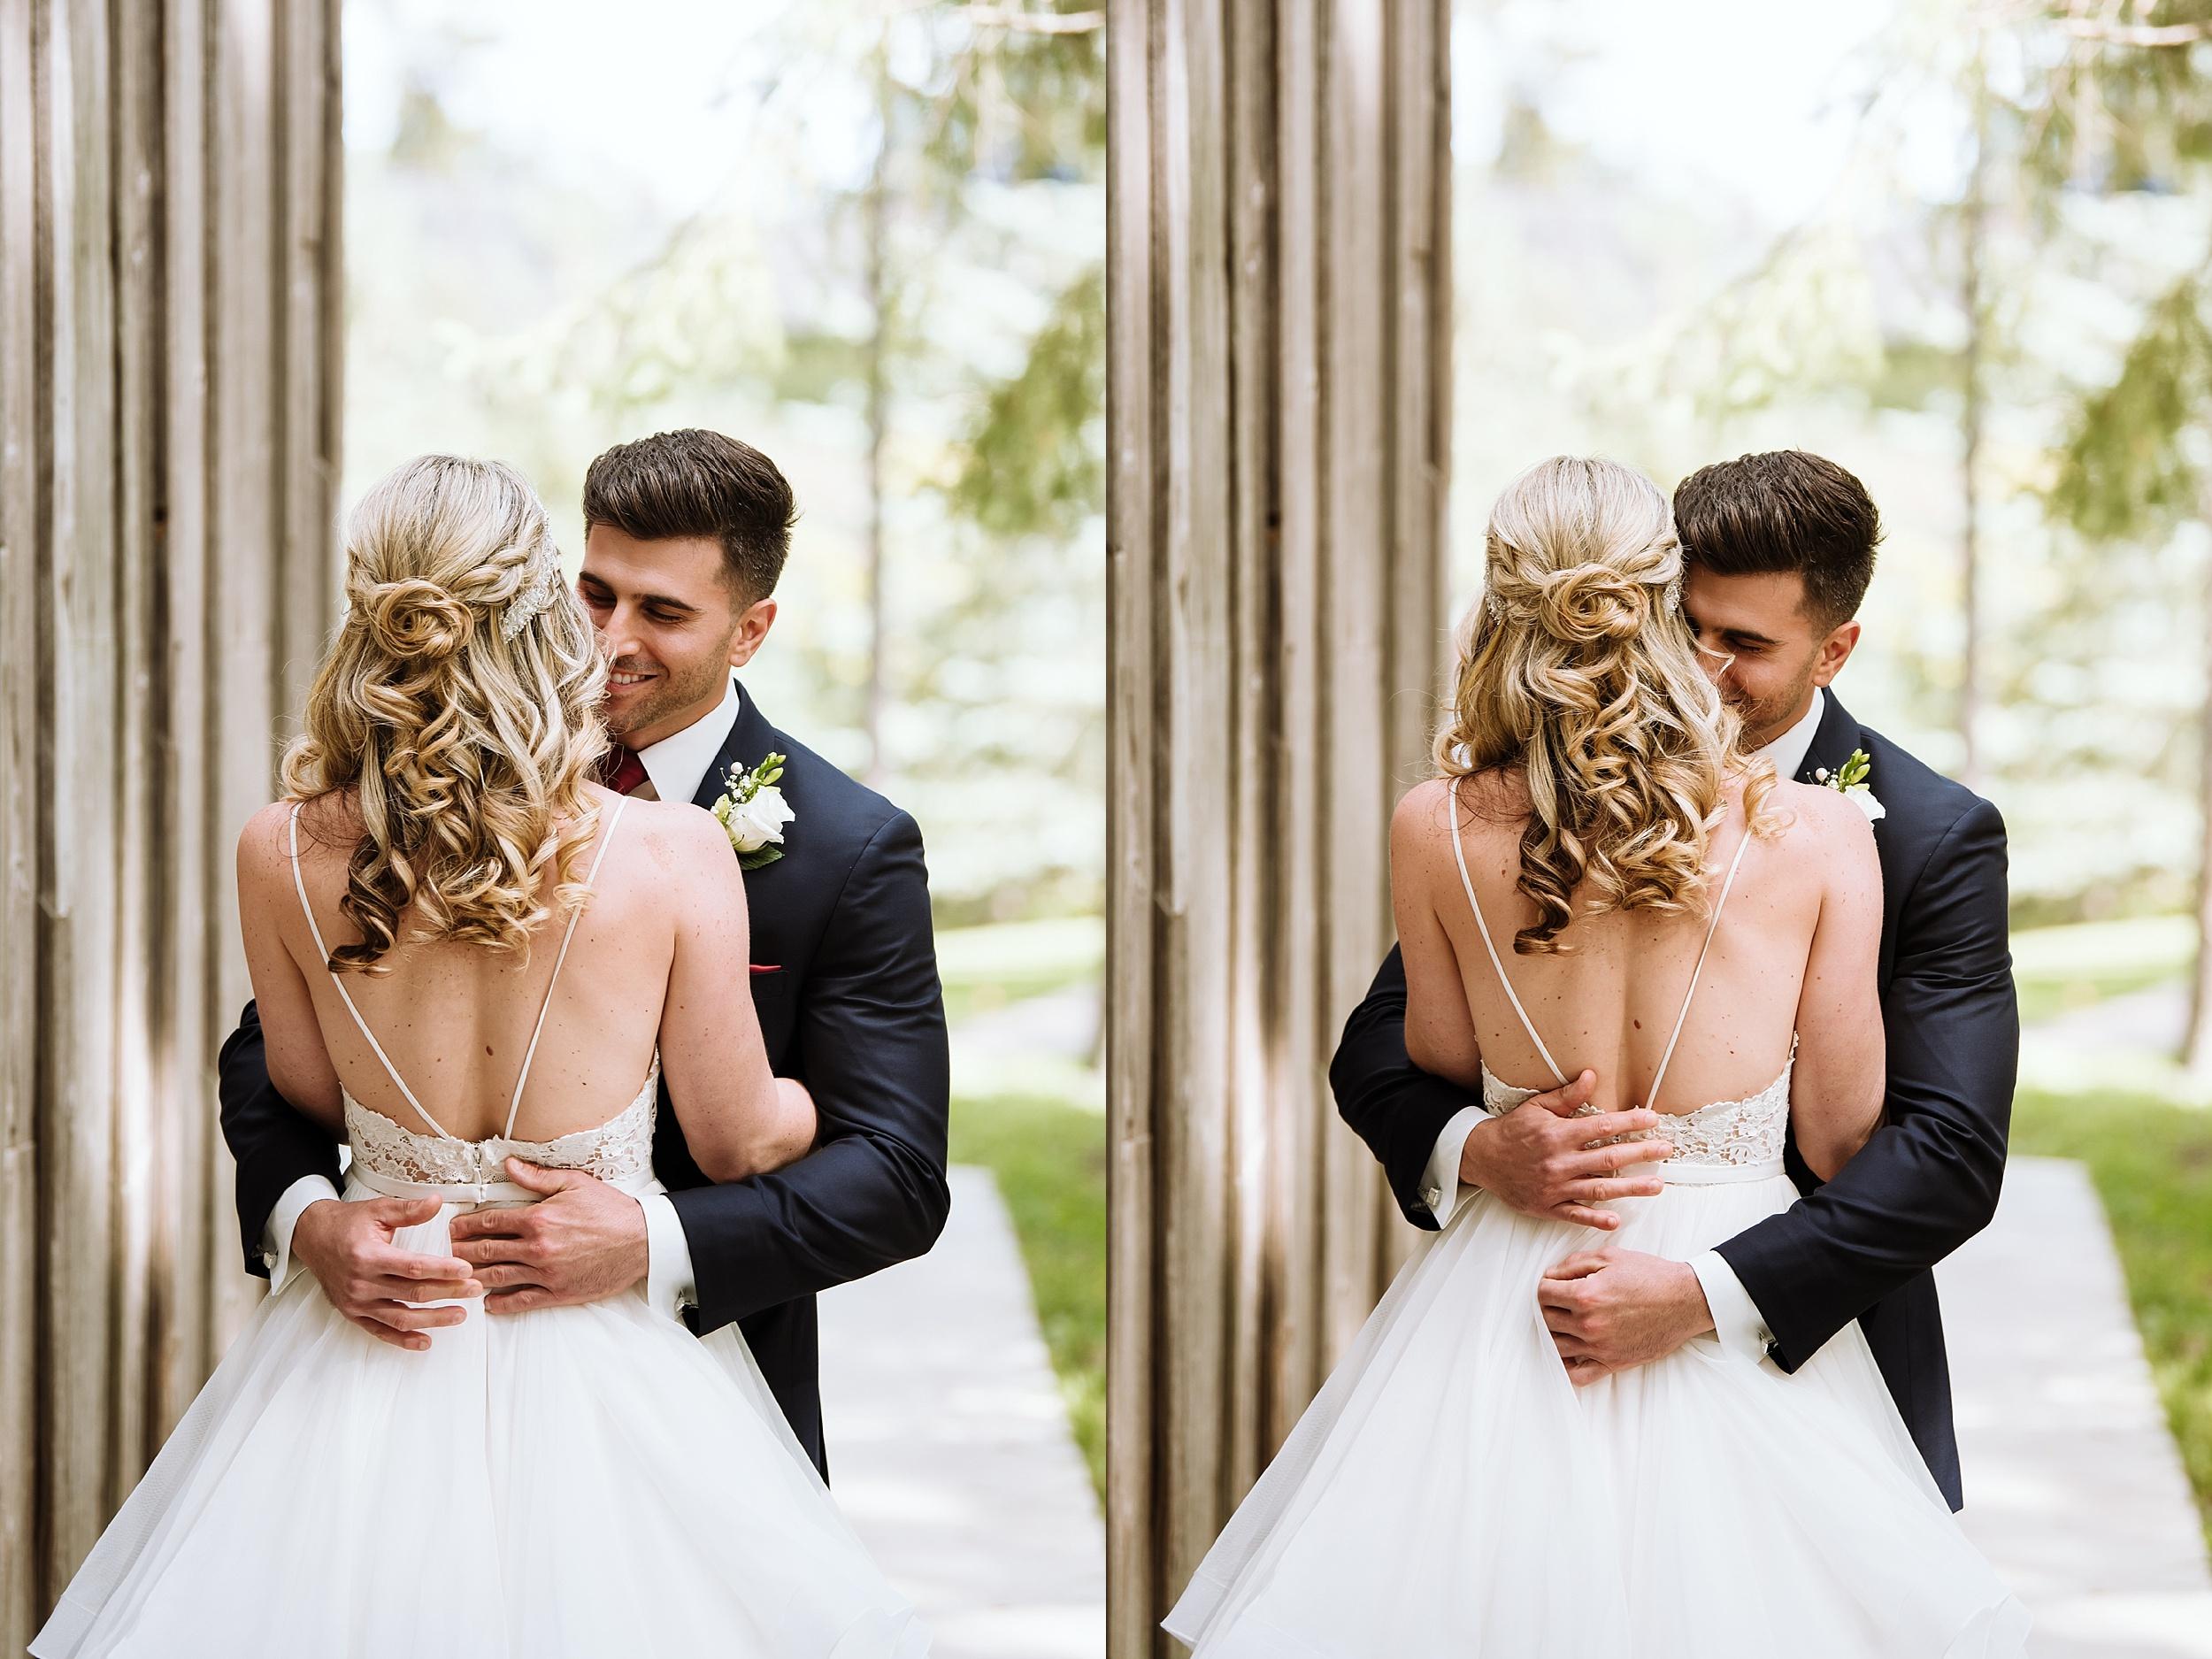 McMichael_Art_Collection_Wedding_chateau_le_jardin_Justine_Munro_Toronto_Photographer008.jpg